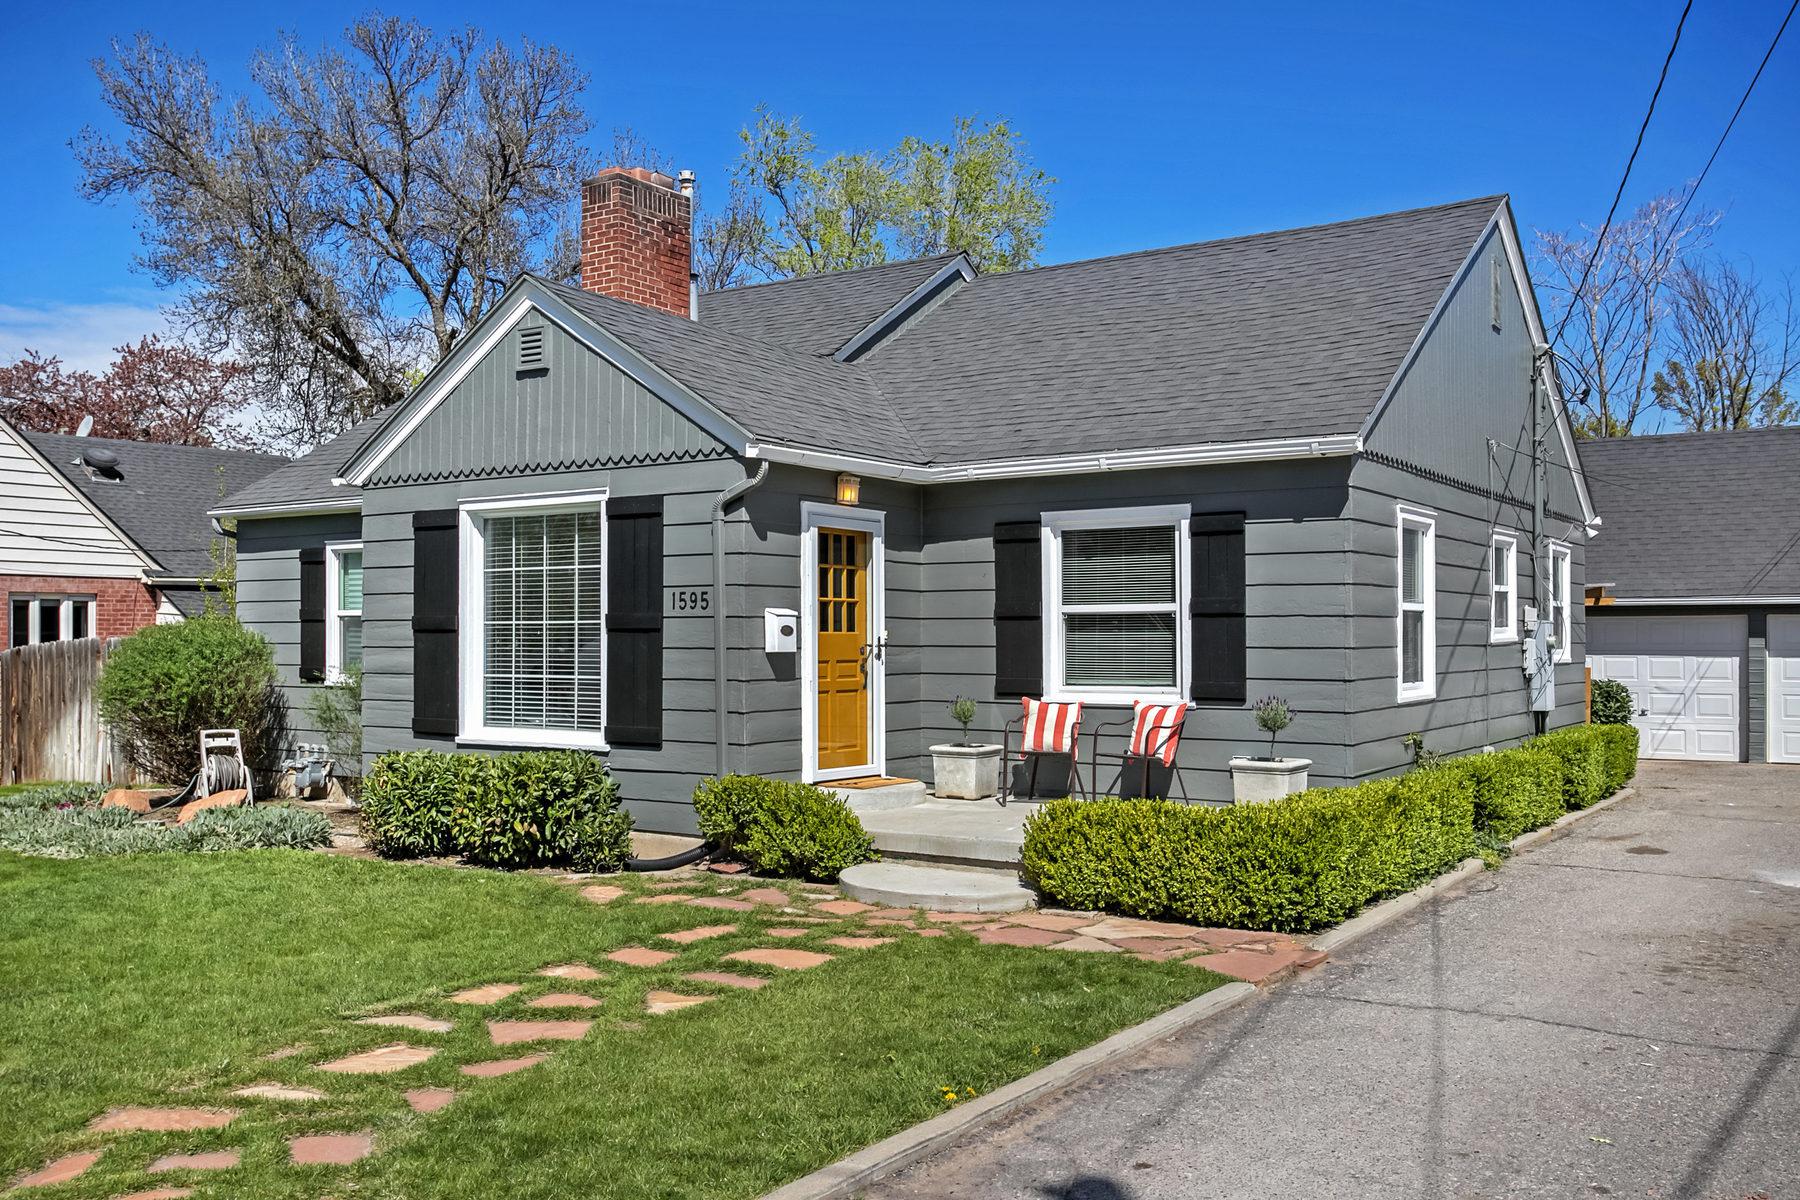 独户住宅 为 销售 在 Marvelous Millcreek Rambler 1595 E Woodland Ave 盐湖城市, 犹他州, 84106 美国